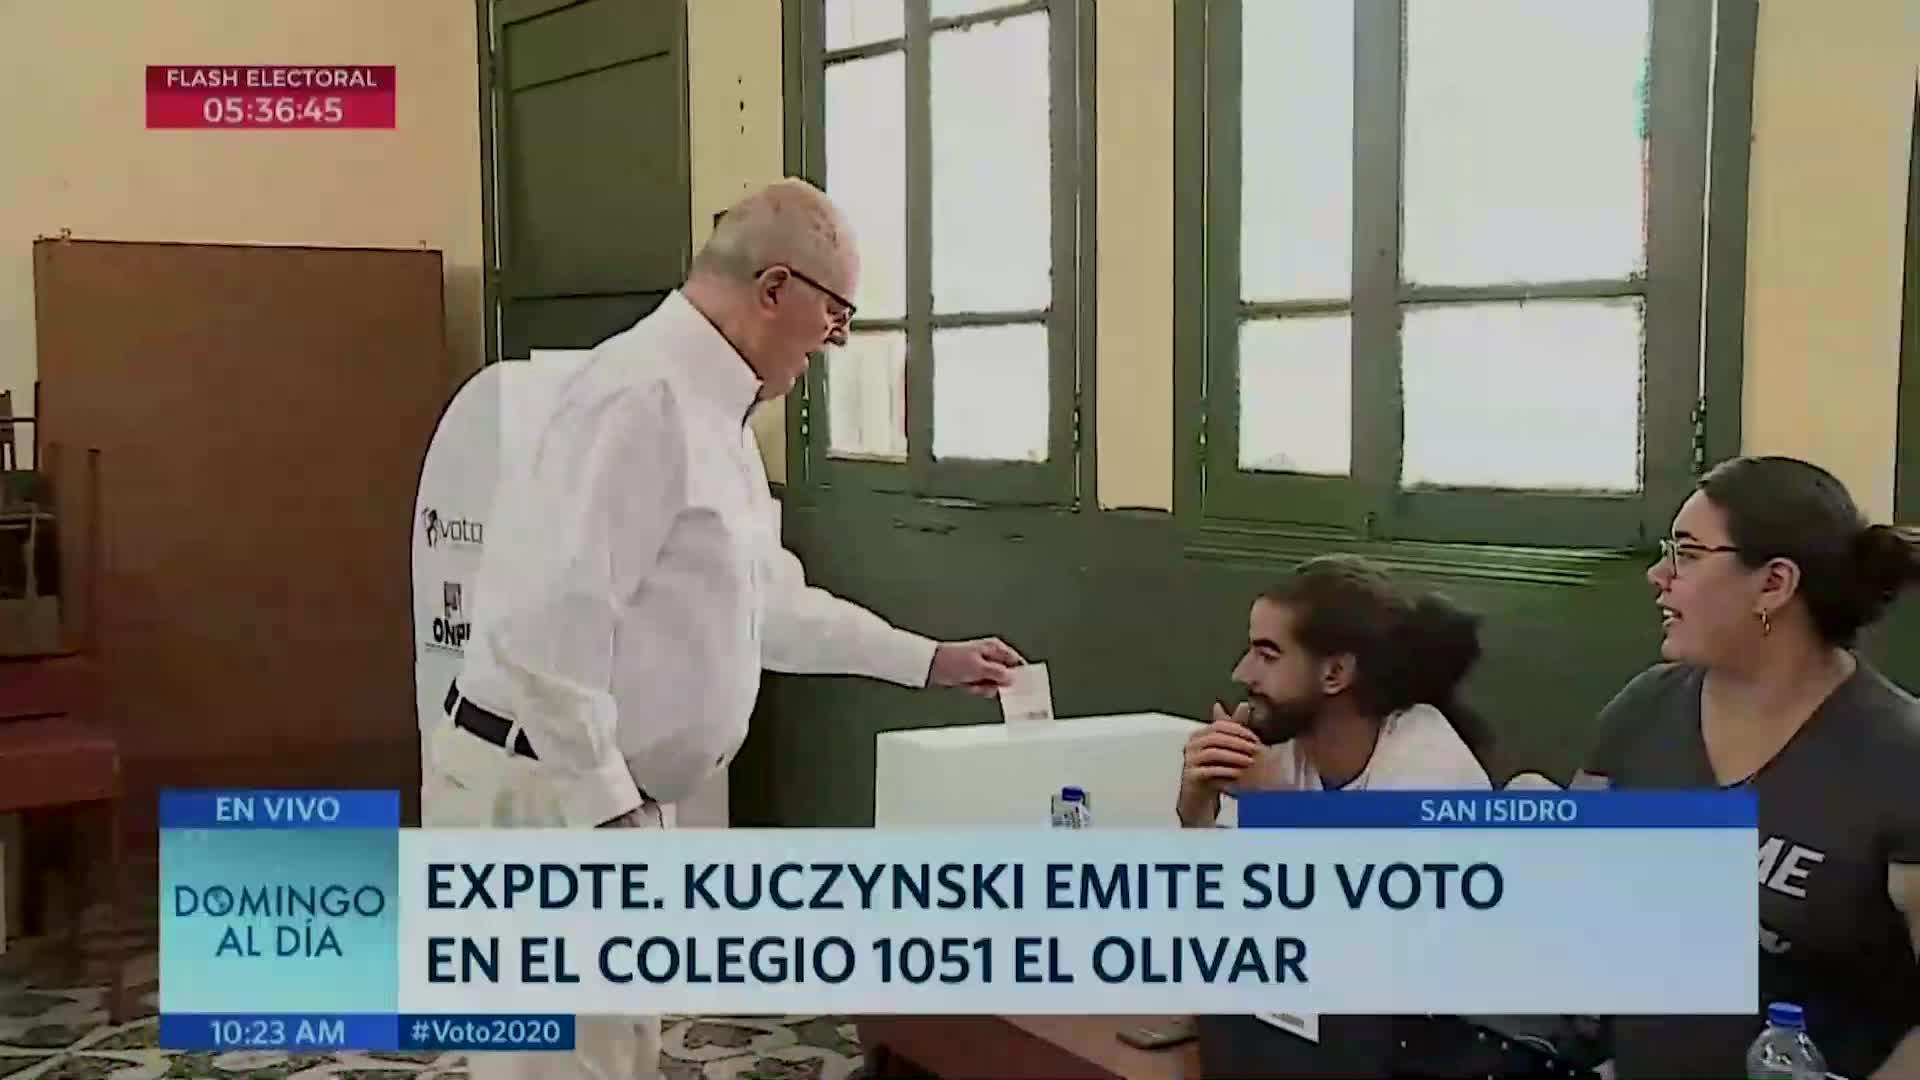 Elecciones 2020: expresidente Pedro Pablo Kuczynski emitió su voto tras permiso judicial